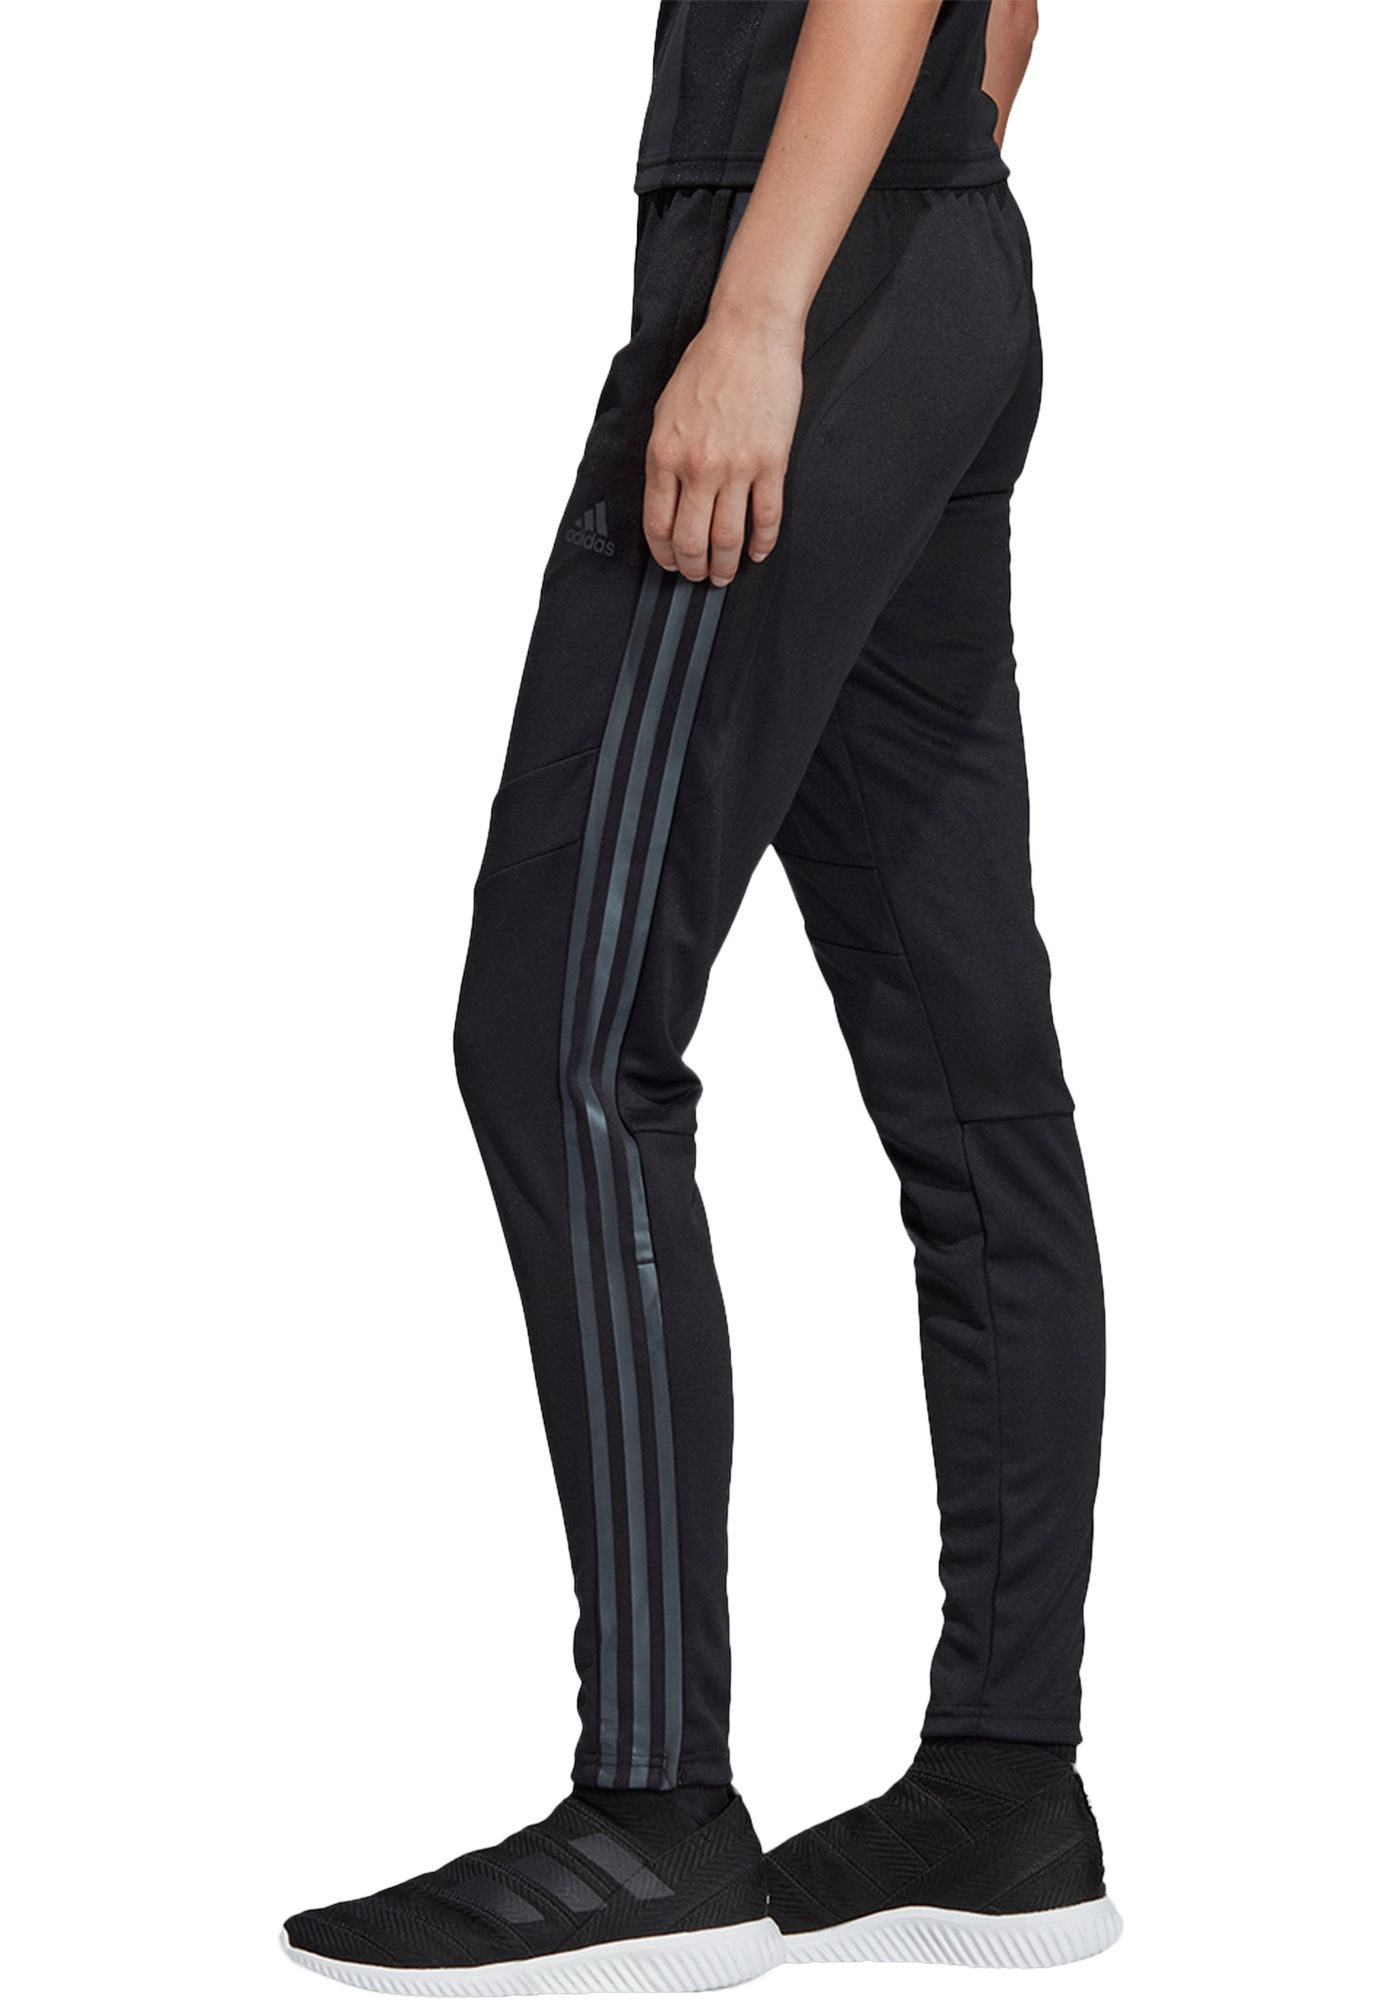 adidas Women's Metallic Tiro 19 Soccer Training Pants